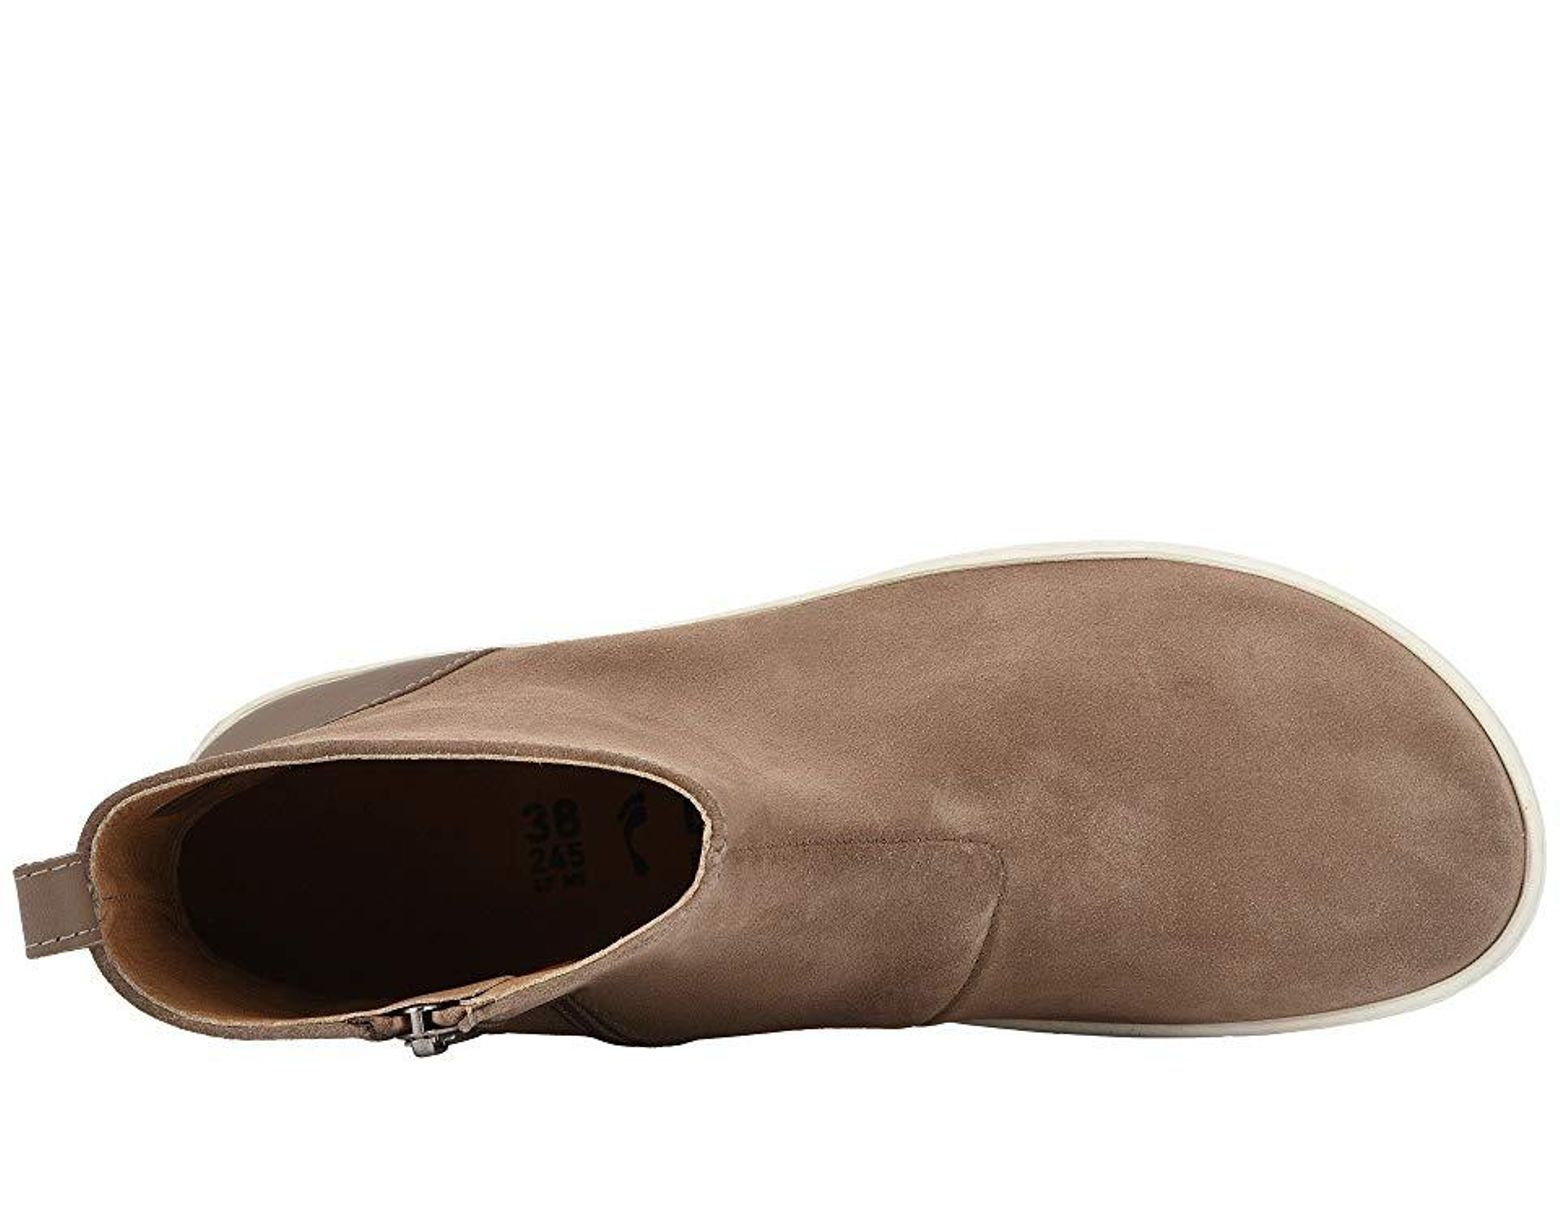 7bda4815 Birkenstock Myra (taupe Suede) Shoes in Brown - Save 25% - Lyst